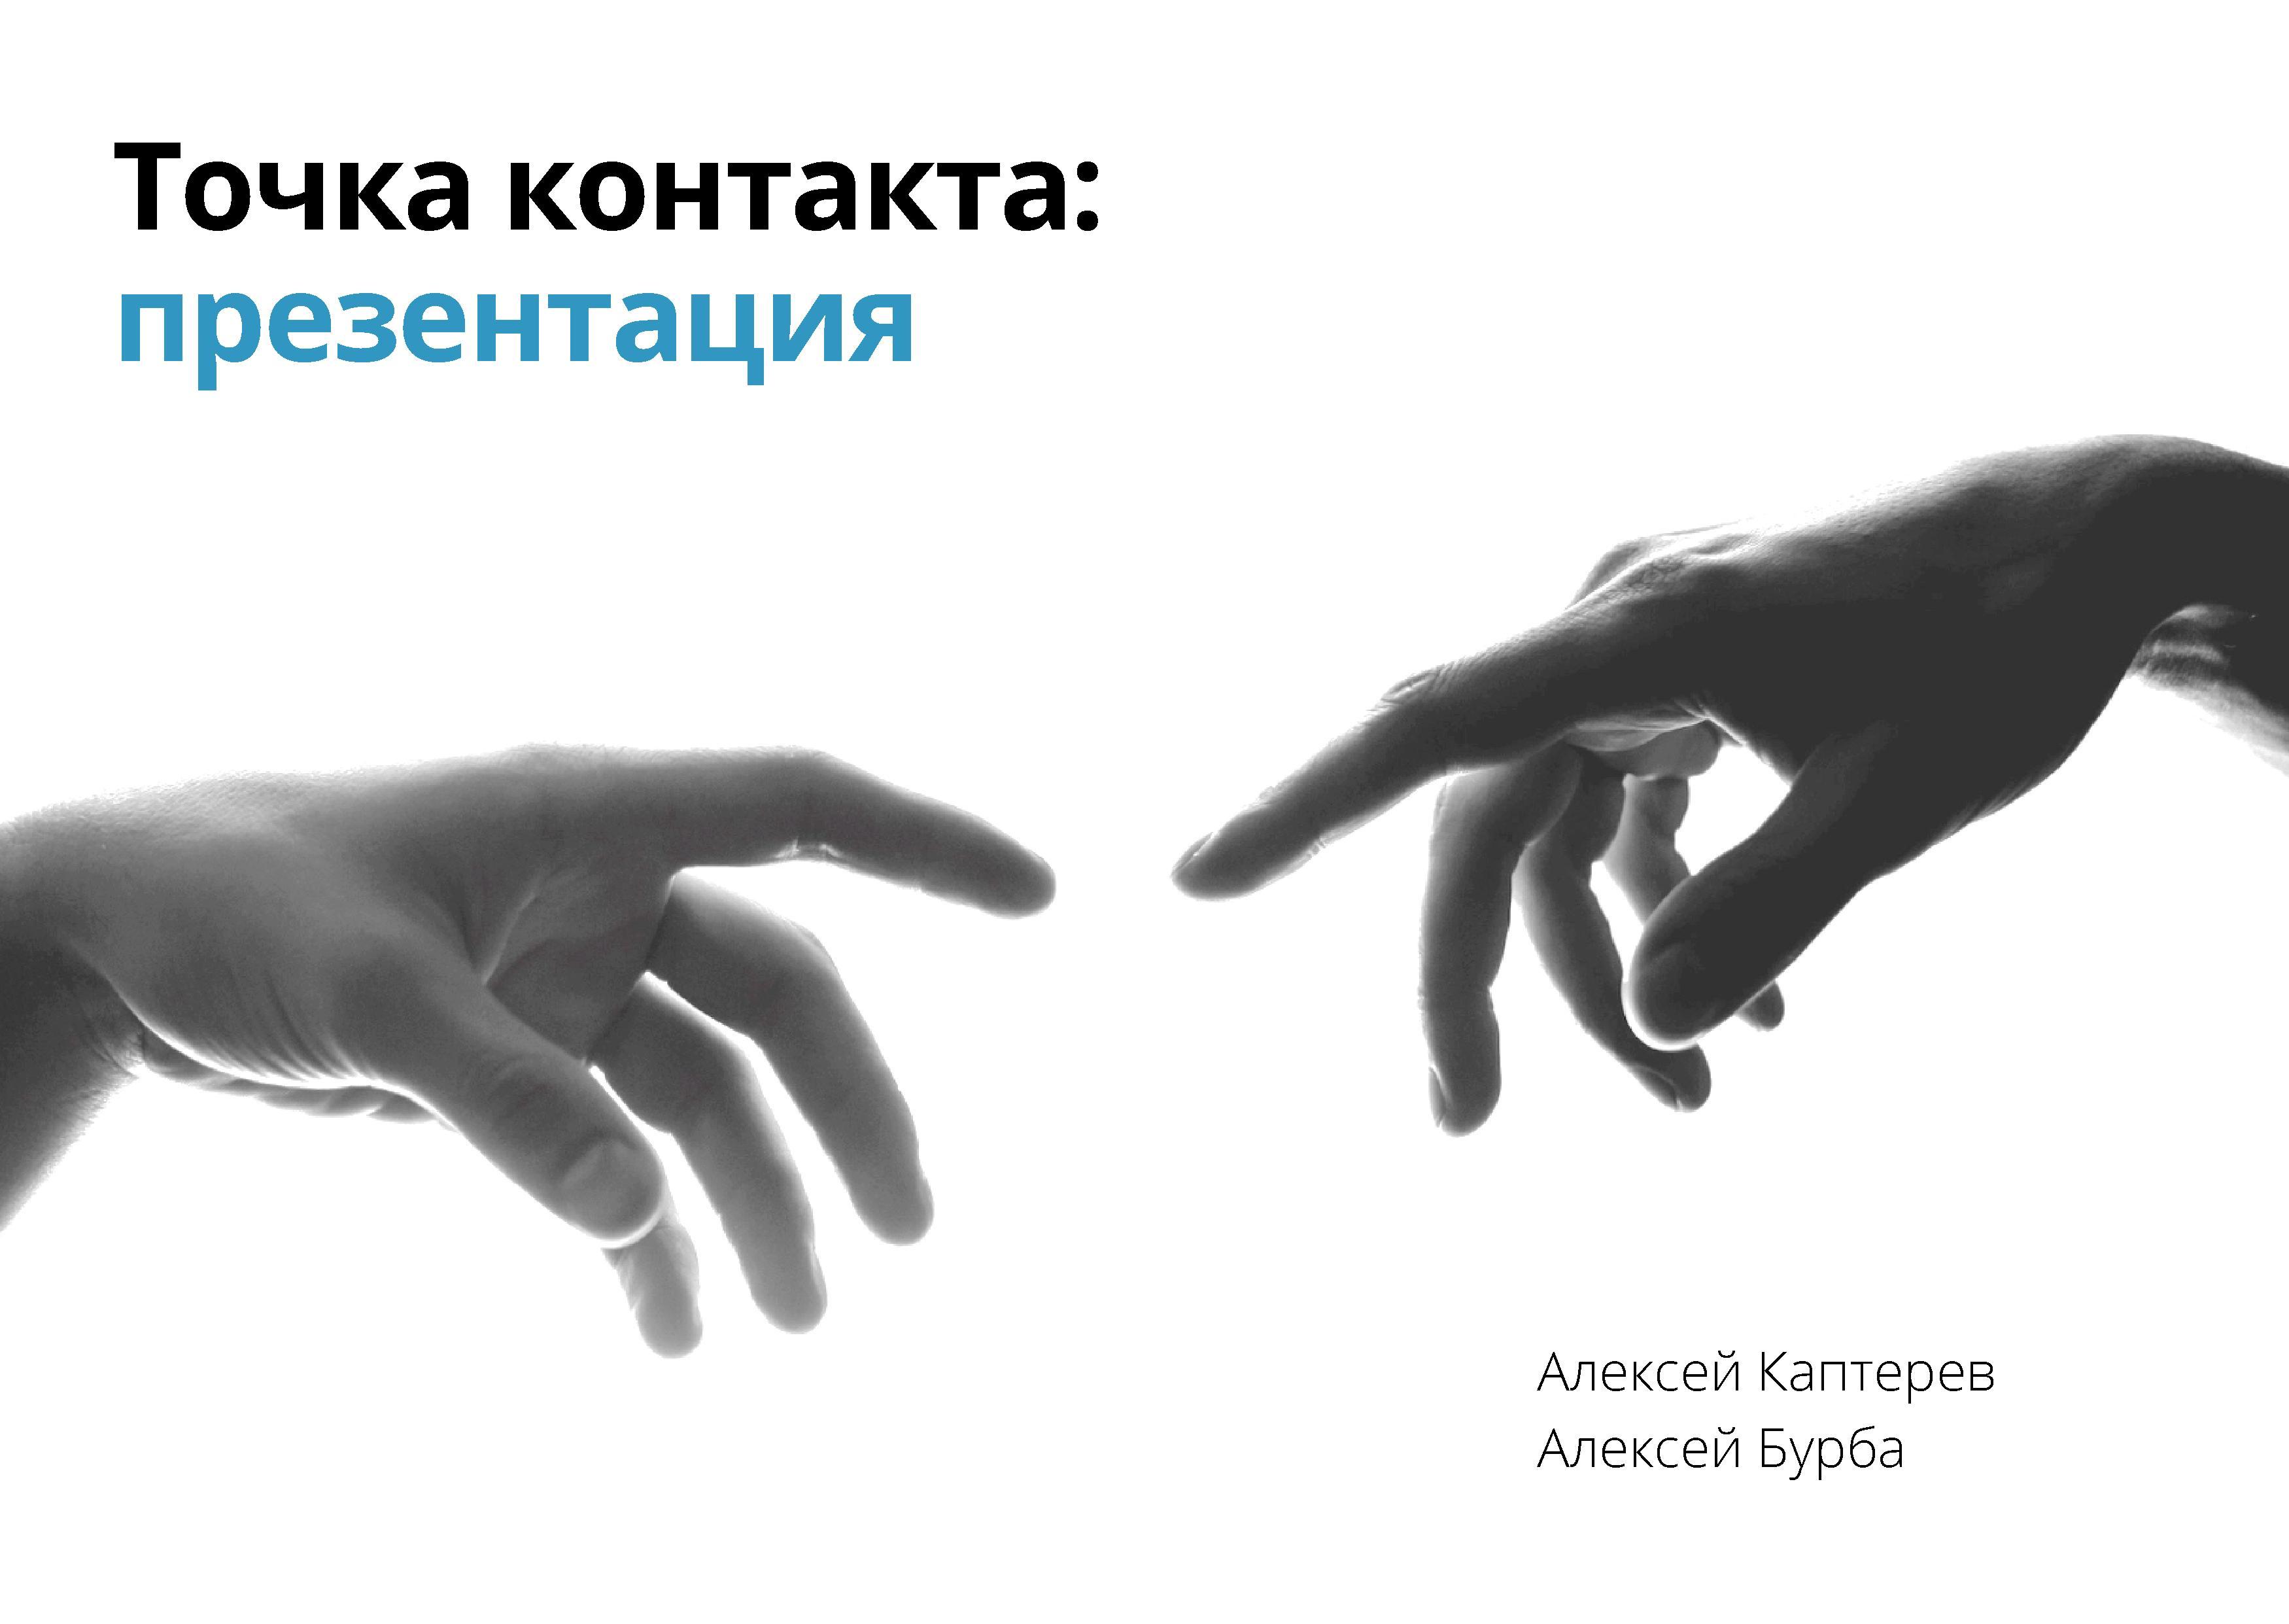 Алексей Каптерев Точка контакта: презентация музыка для презентация